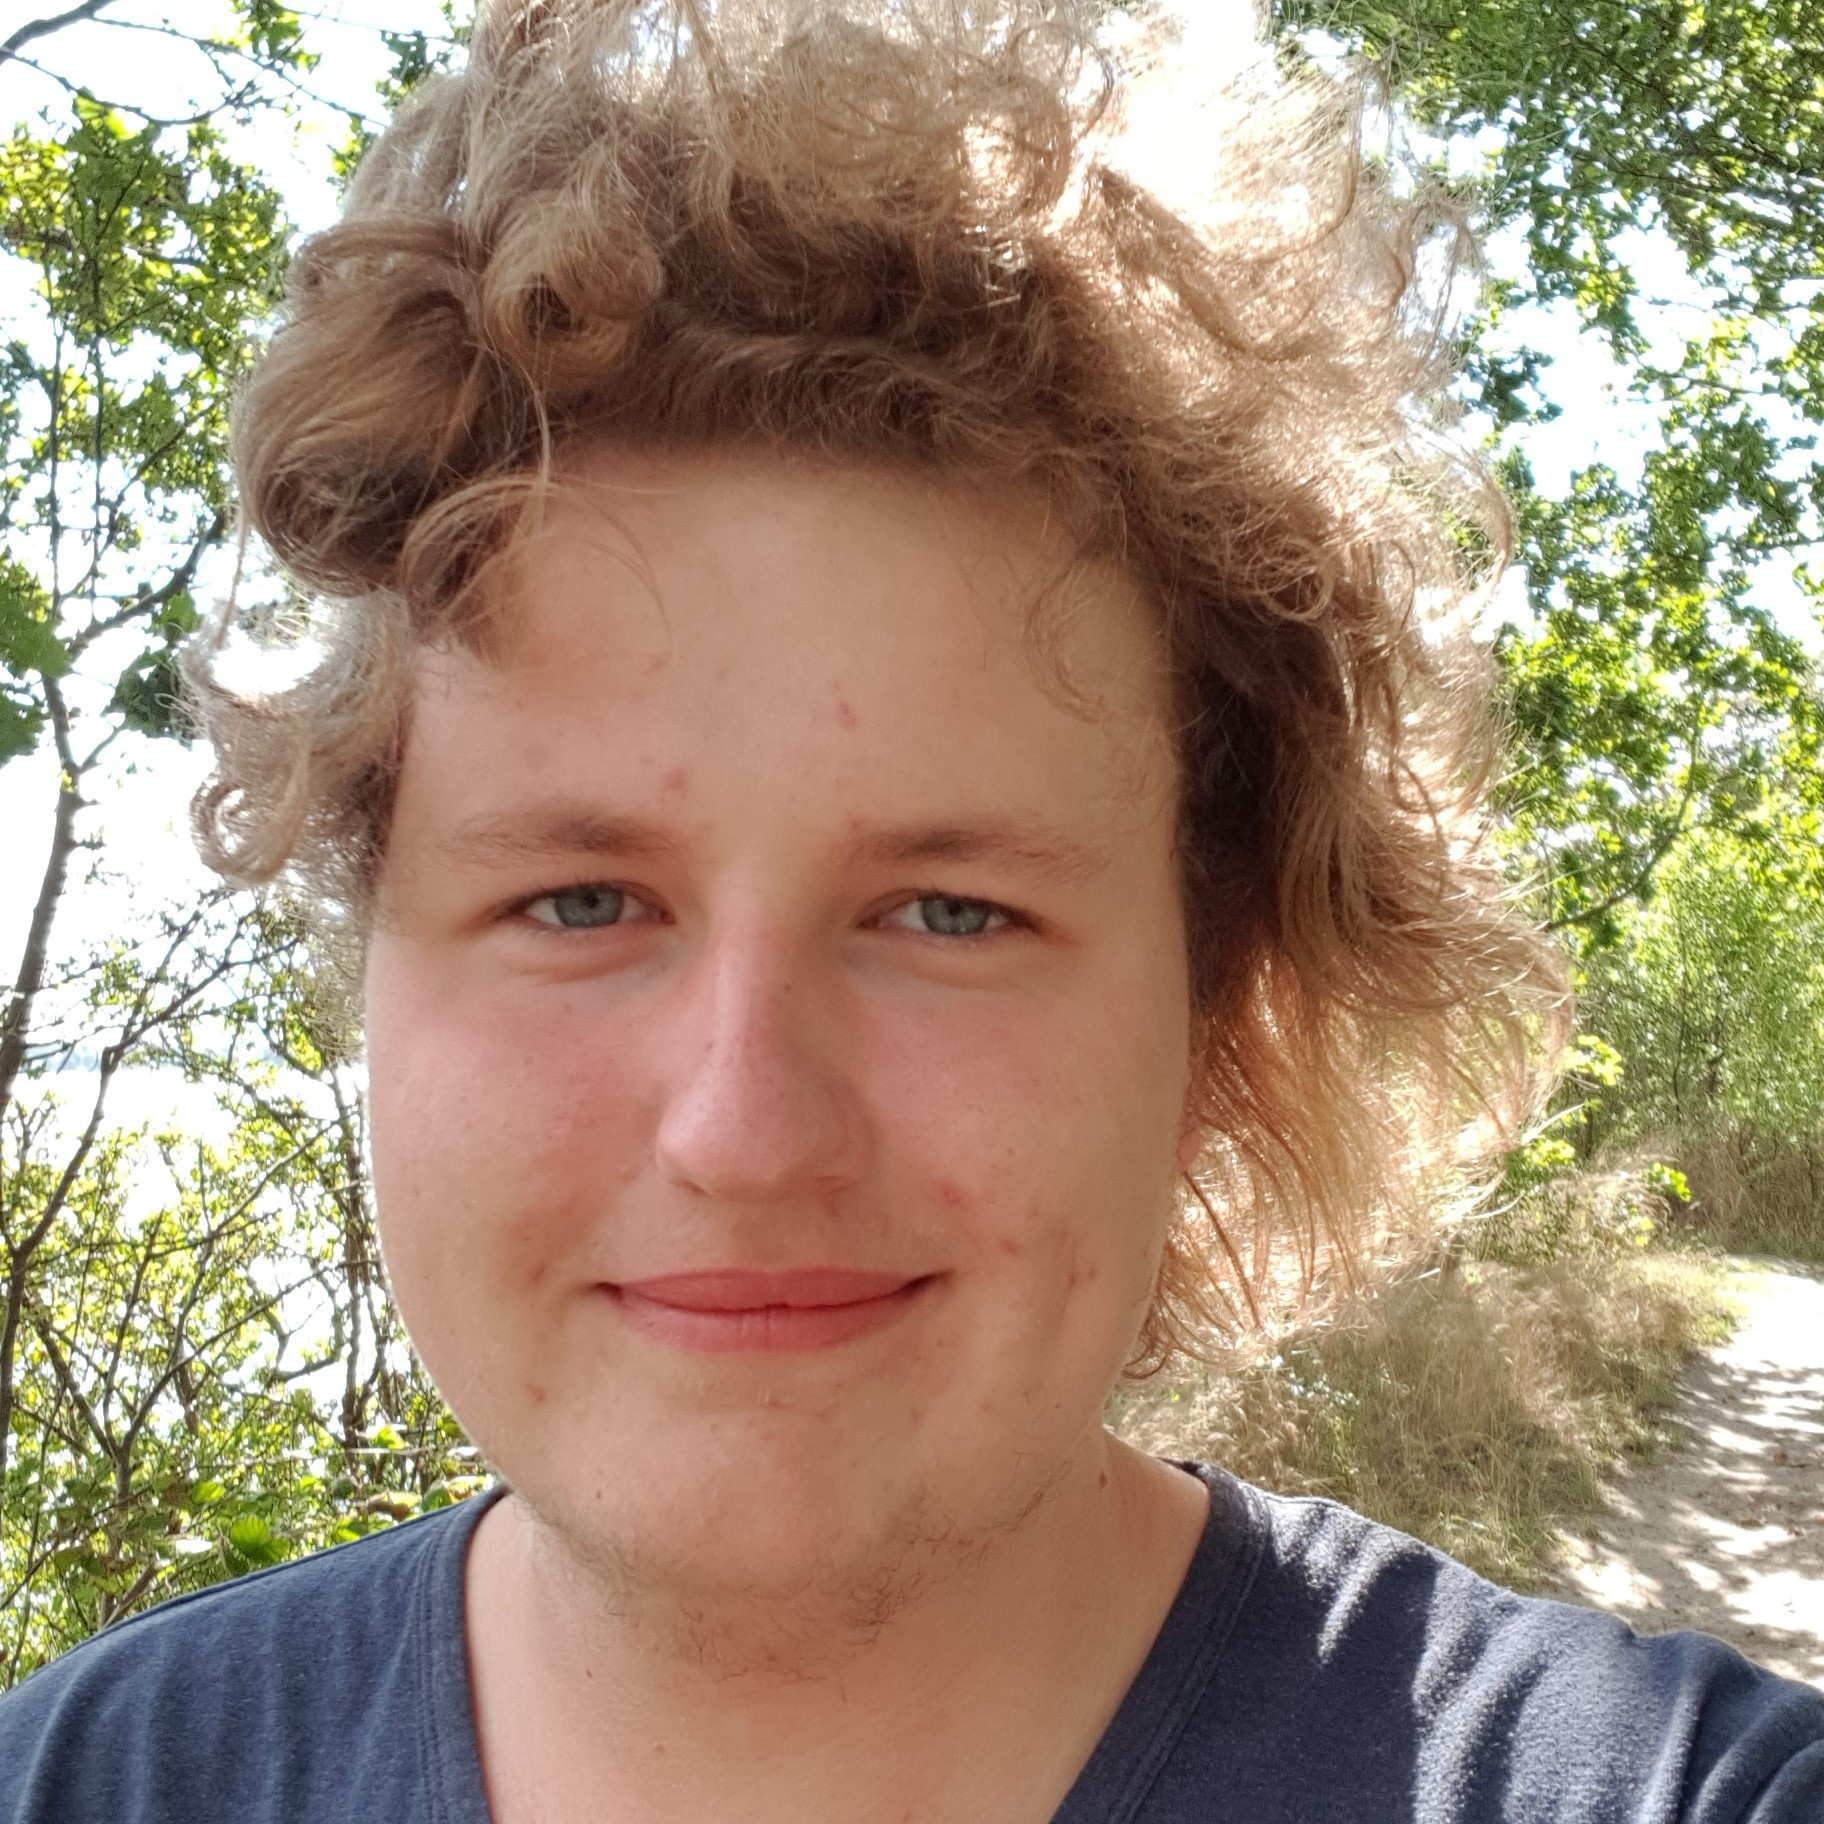 Markus Erber